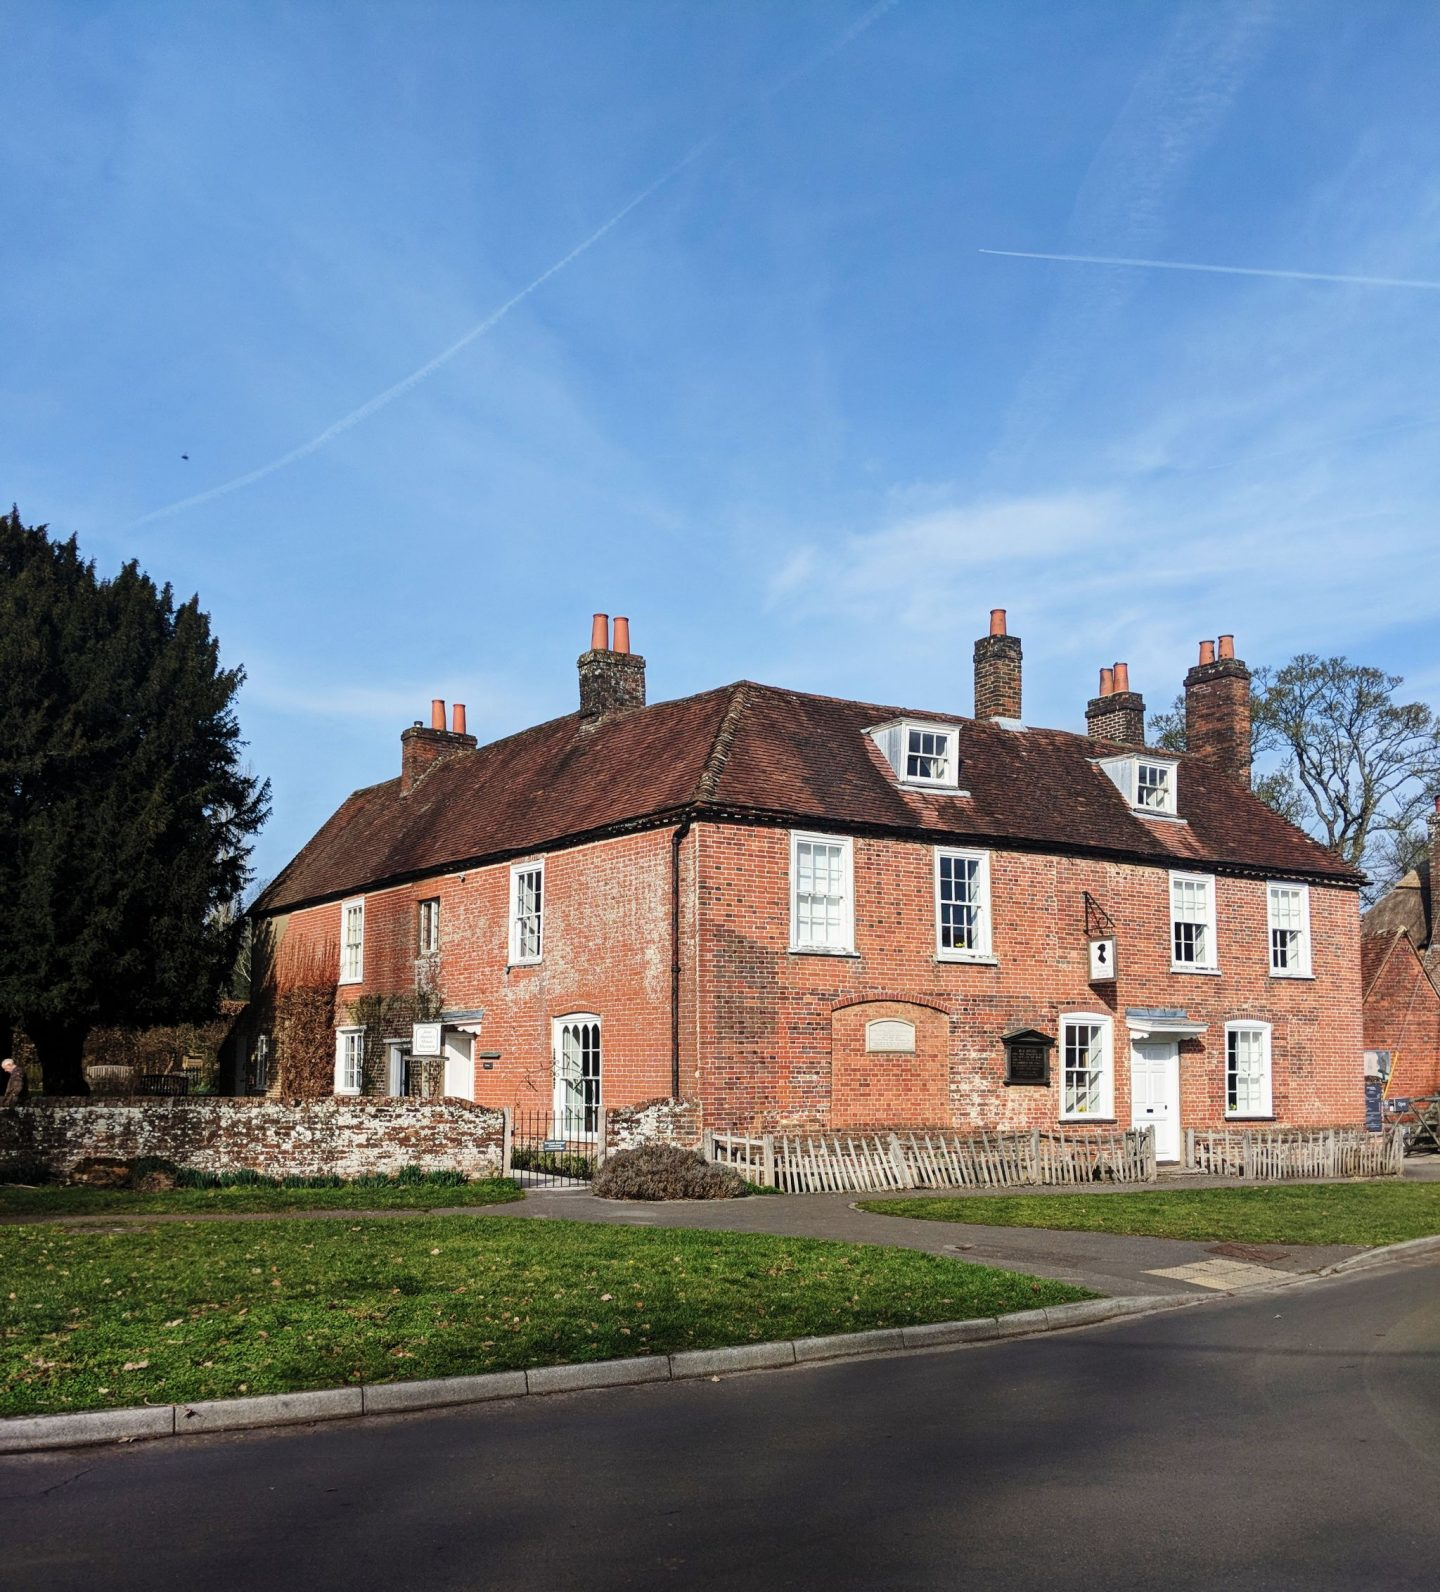 Jane Austen's House Museum Frontage